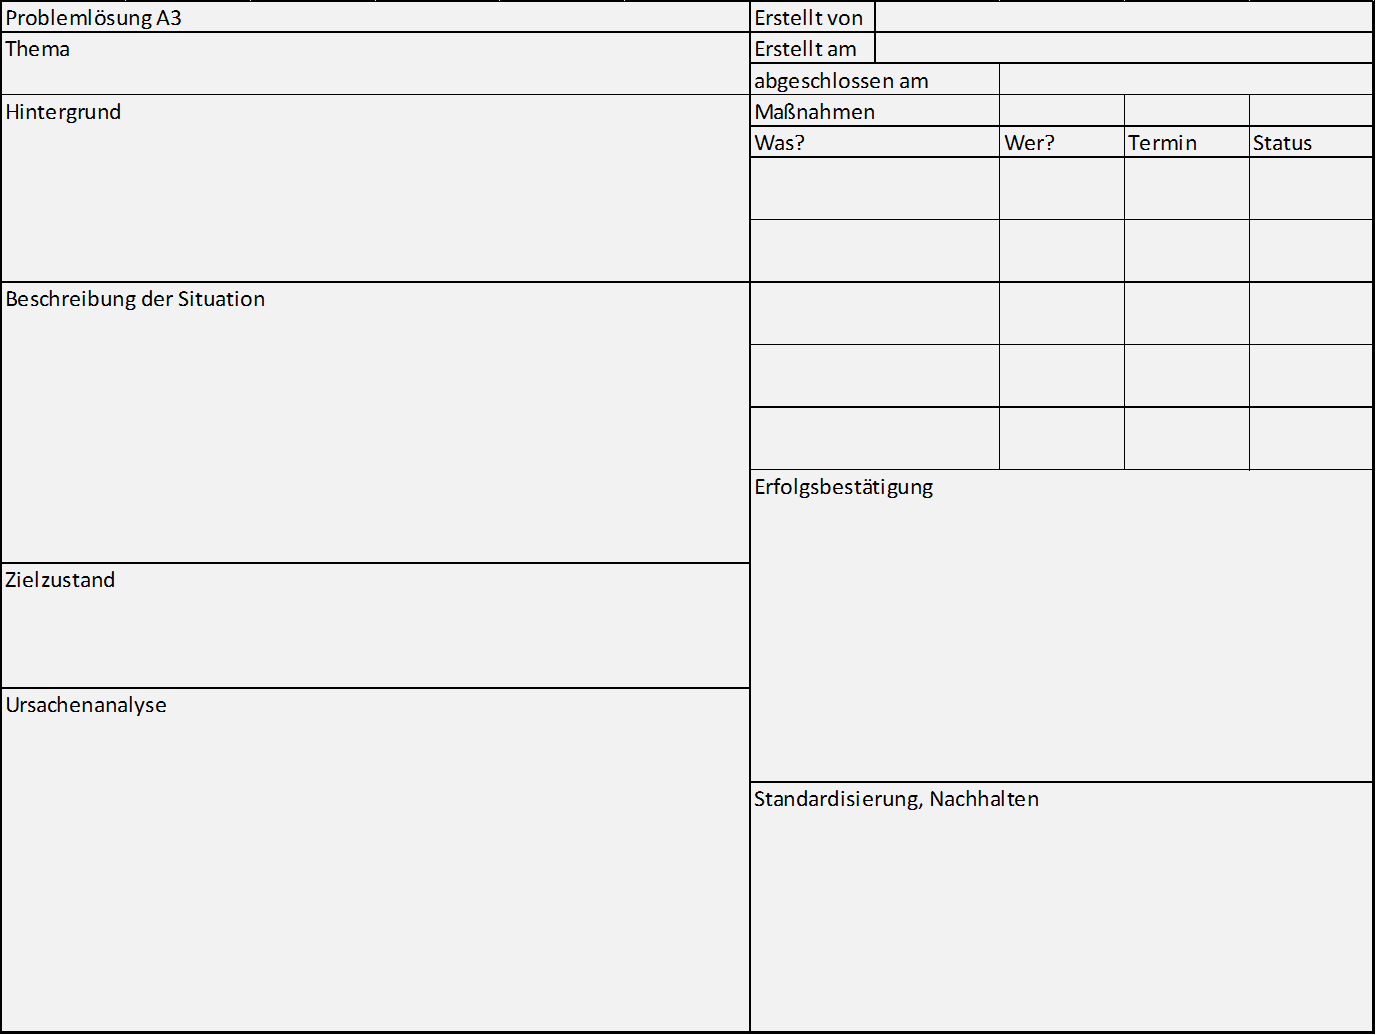 Problemlösung in 7 Schritten: A3-Report